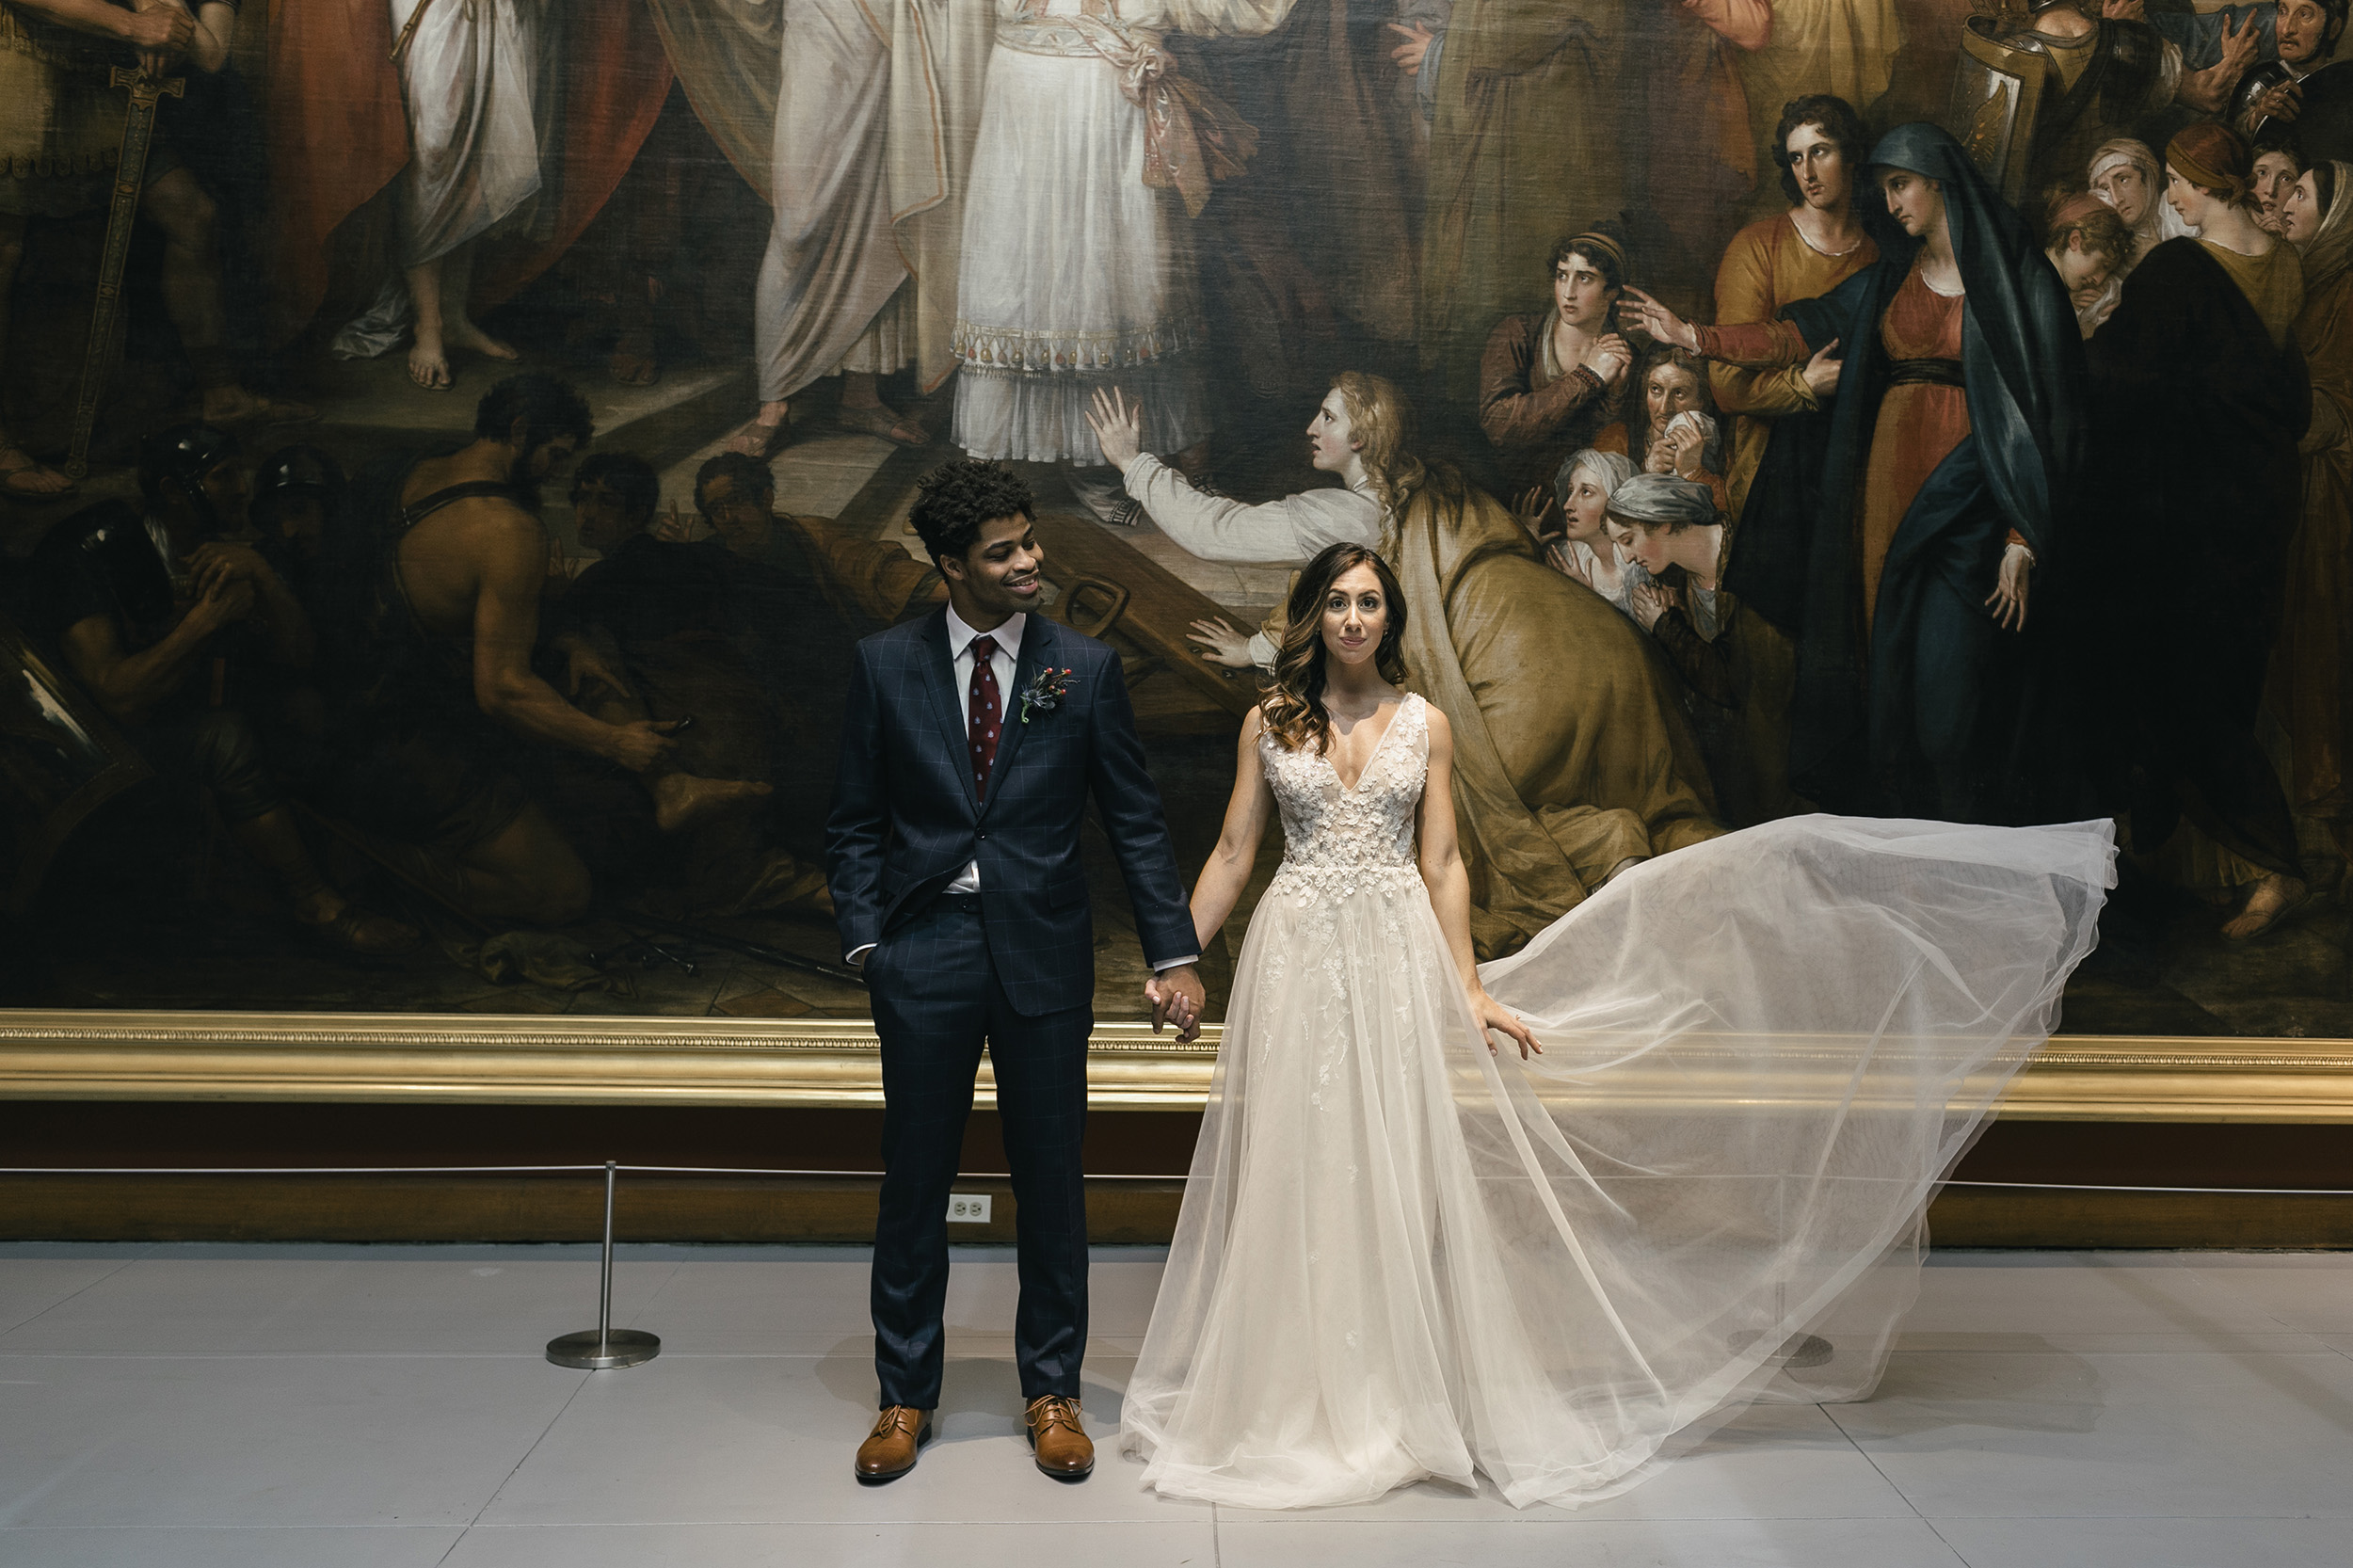 photography-wedding-weddings-natural-candid-pafa-pennsylvania academy-philadephia-philly-philadelphia wedding-mixed race-editorial-modern-fine-art-001.JPG